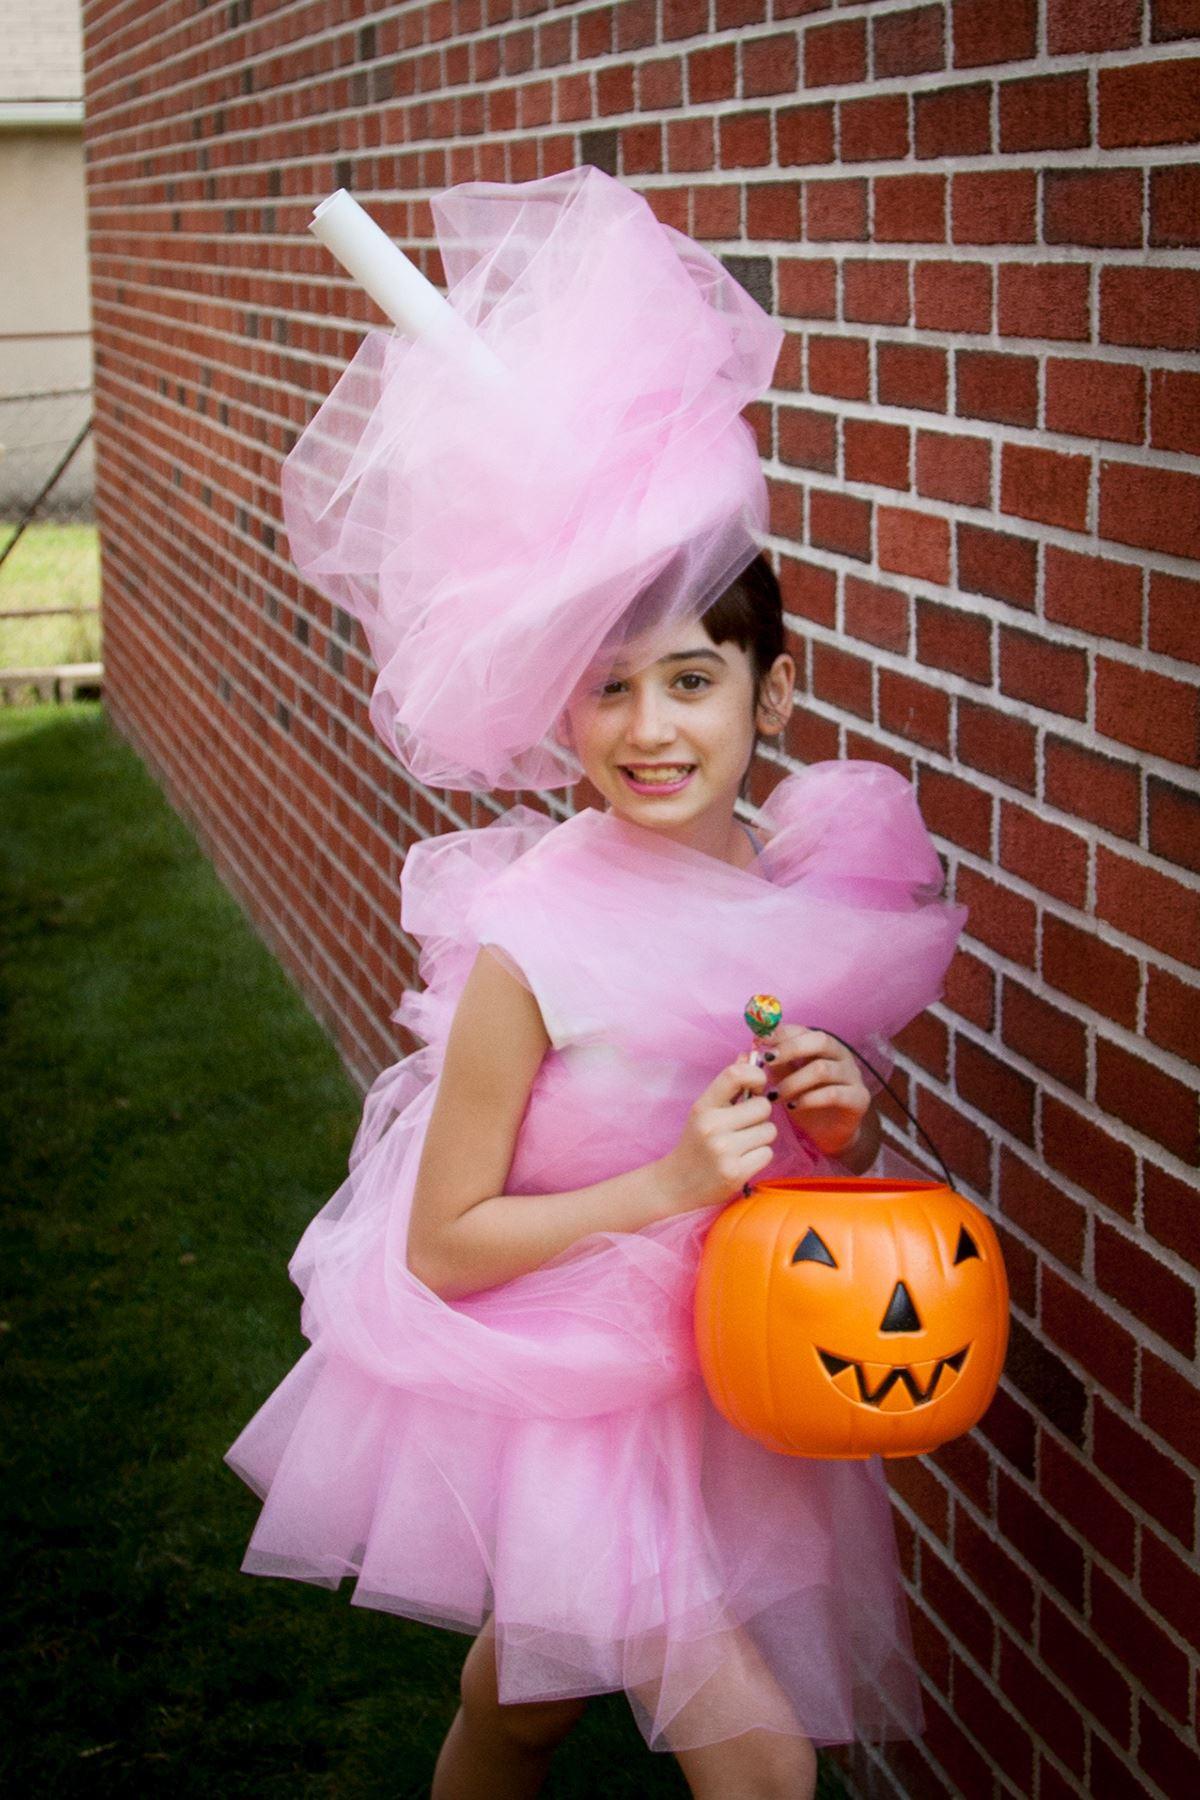 DIY Candy Costume  Aleene's Original Glues DIY Cotton Candy Costume